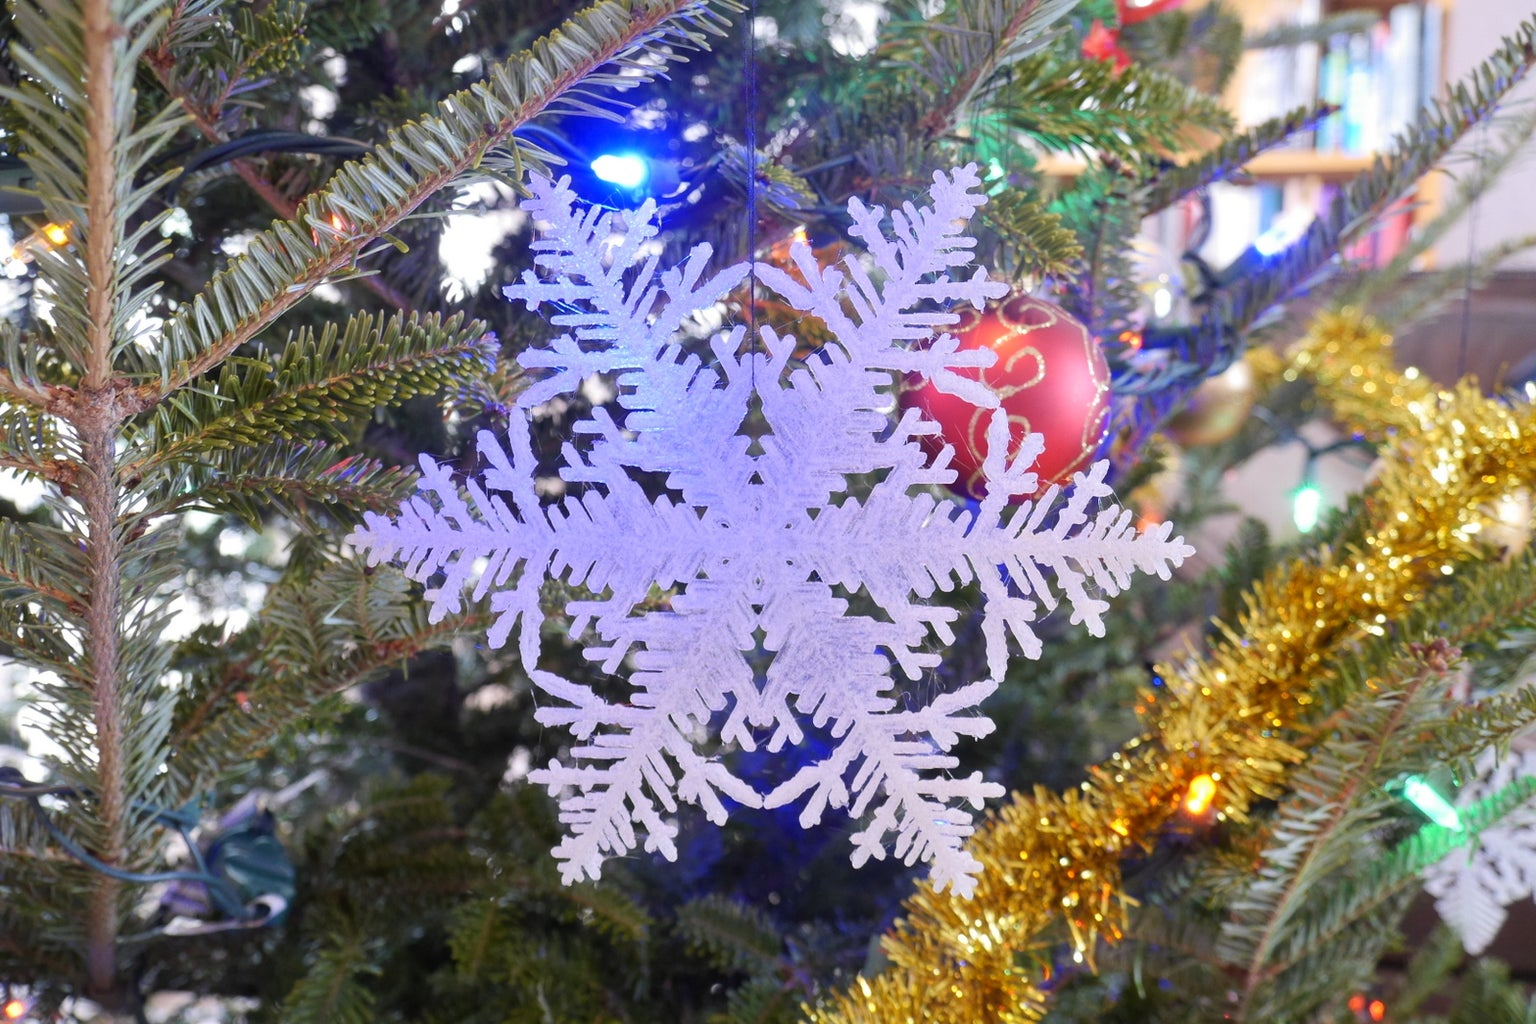 3D Printed Simulated Snowflakes